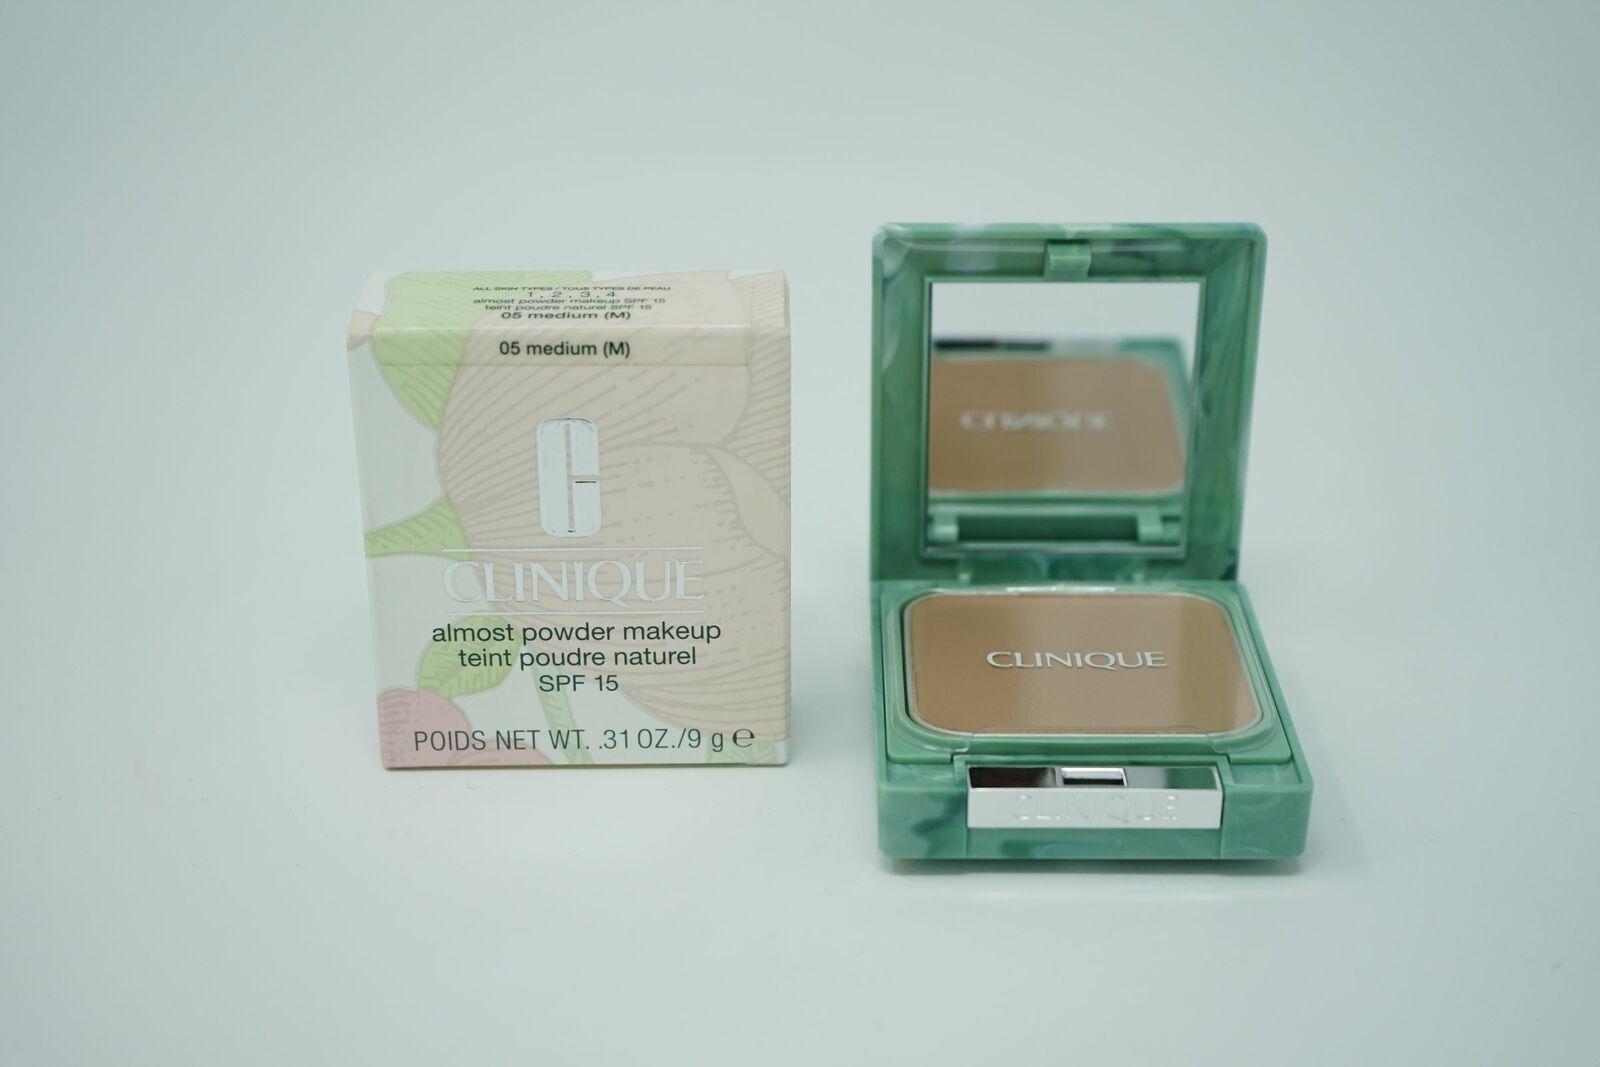 Clinique Almost powder makeup SPF15 medium (M) 05